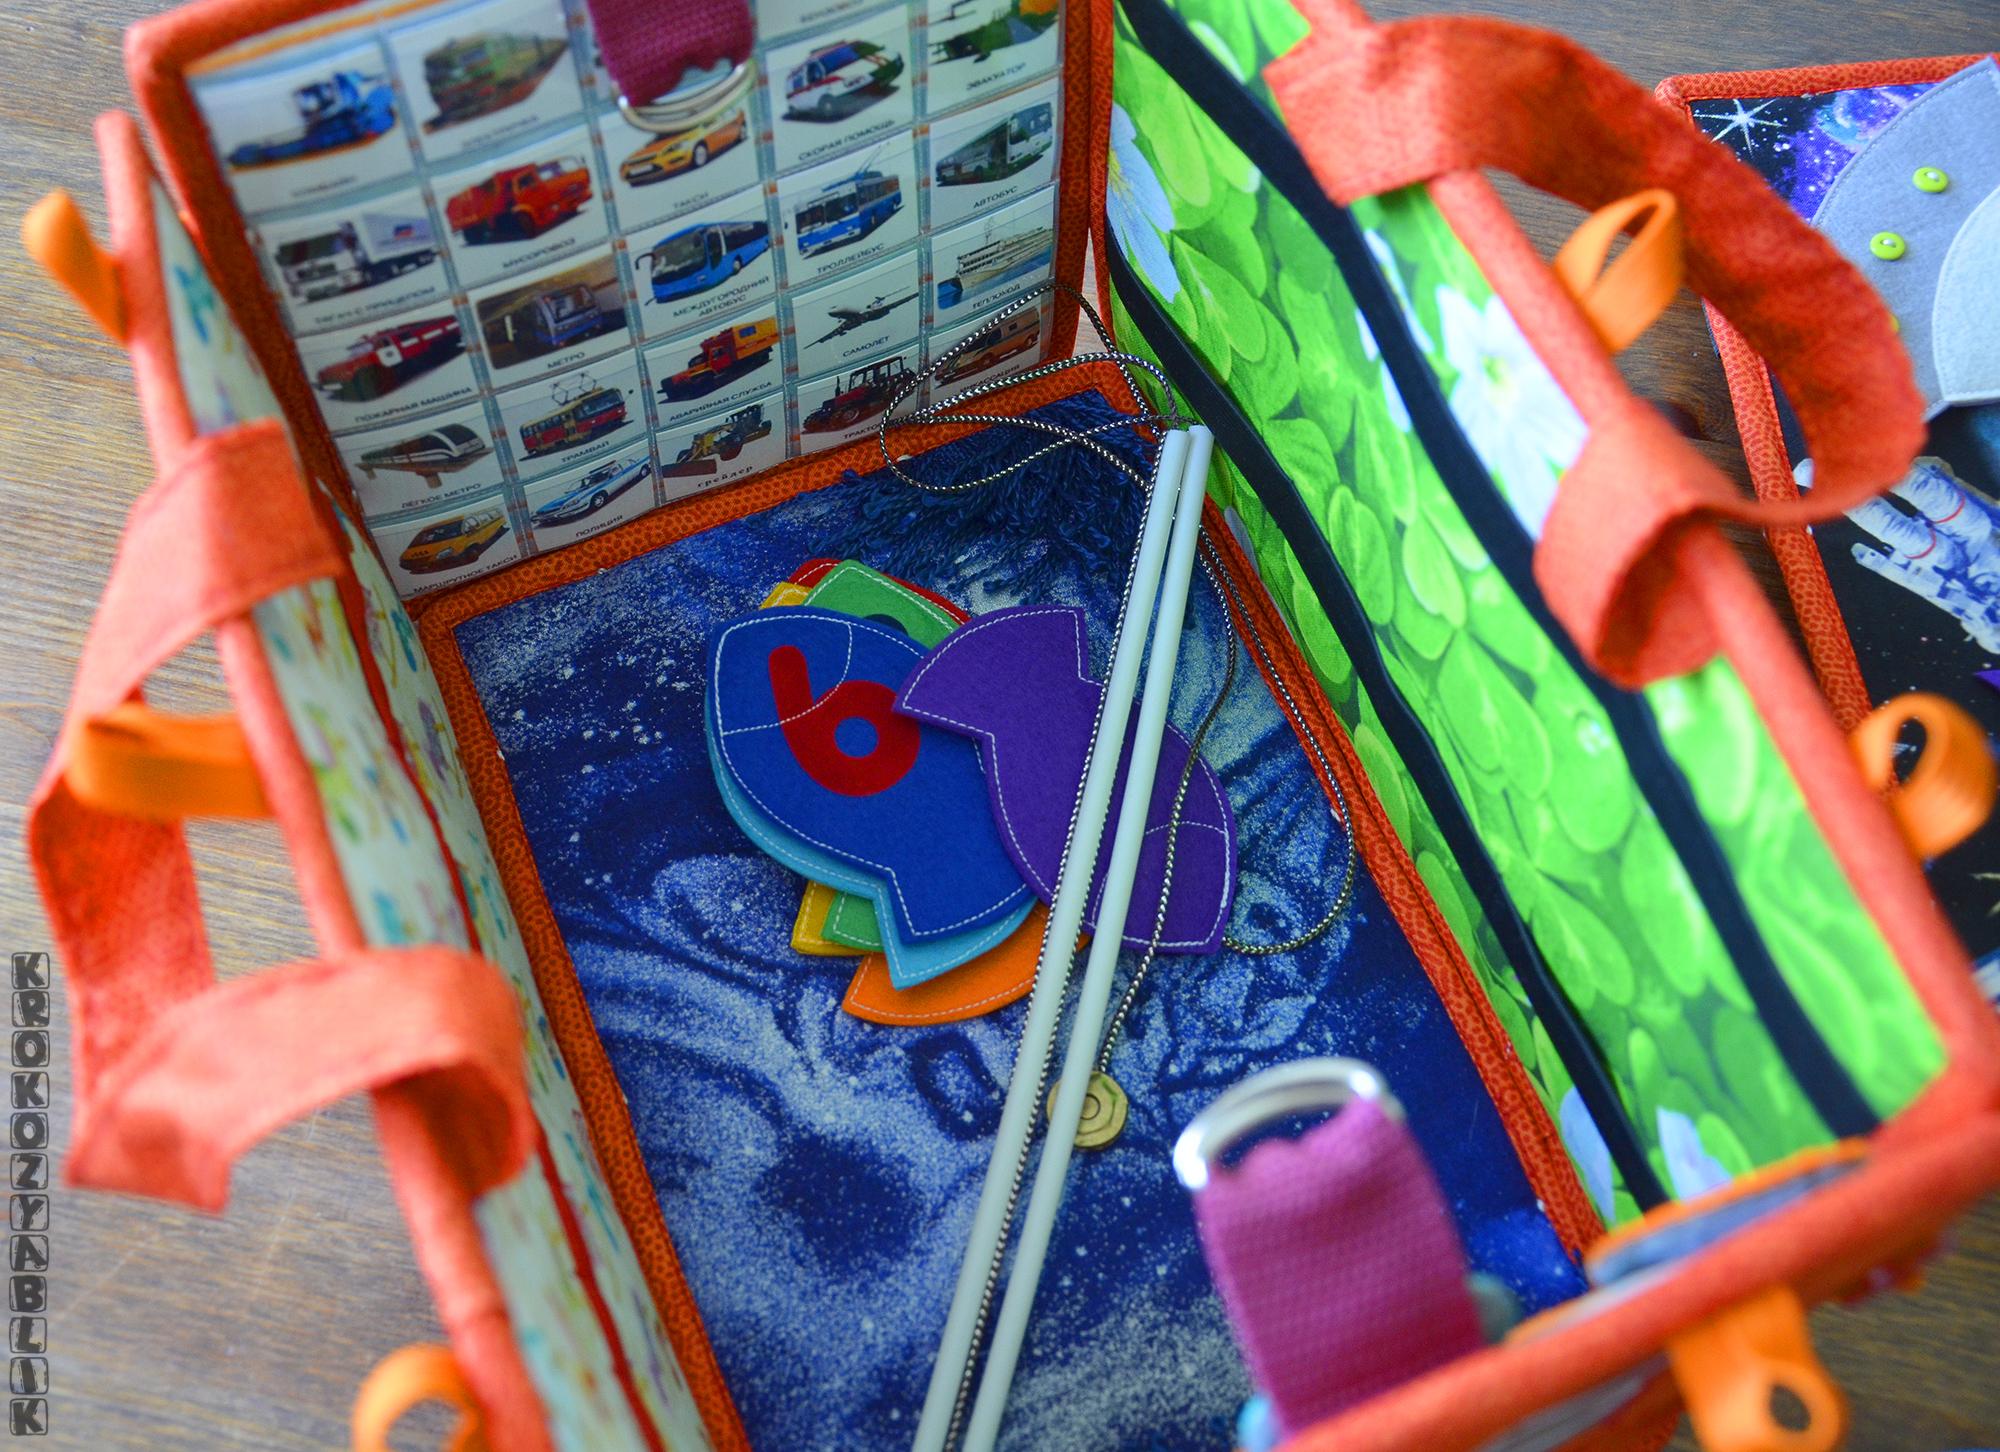 оранжевый автобус сумка конструктор рыбалка 1.JPG